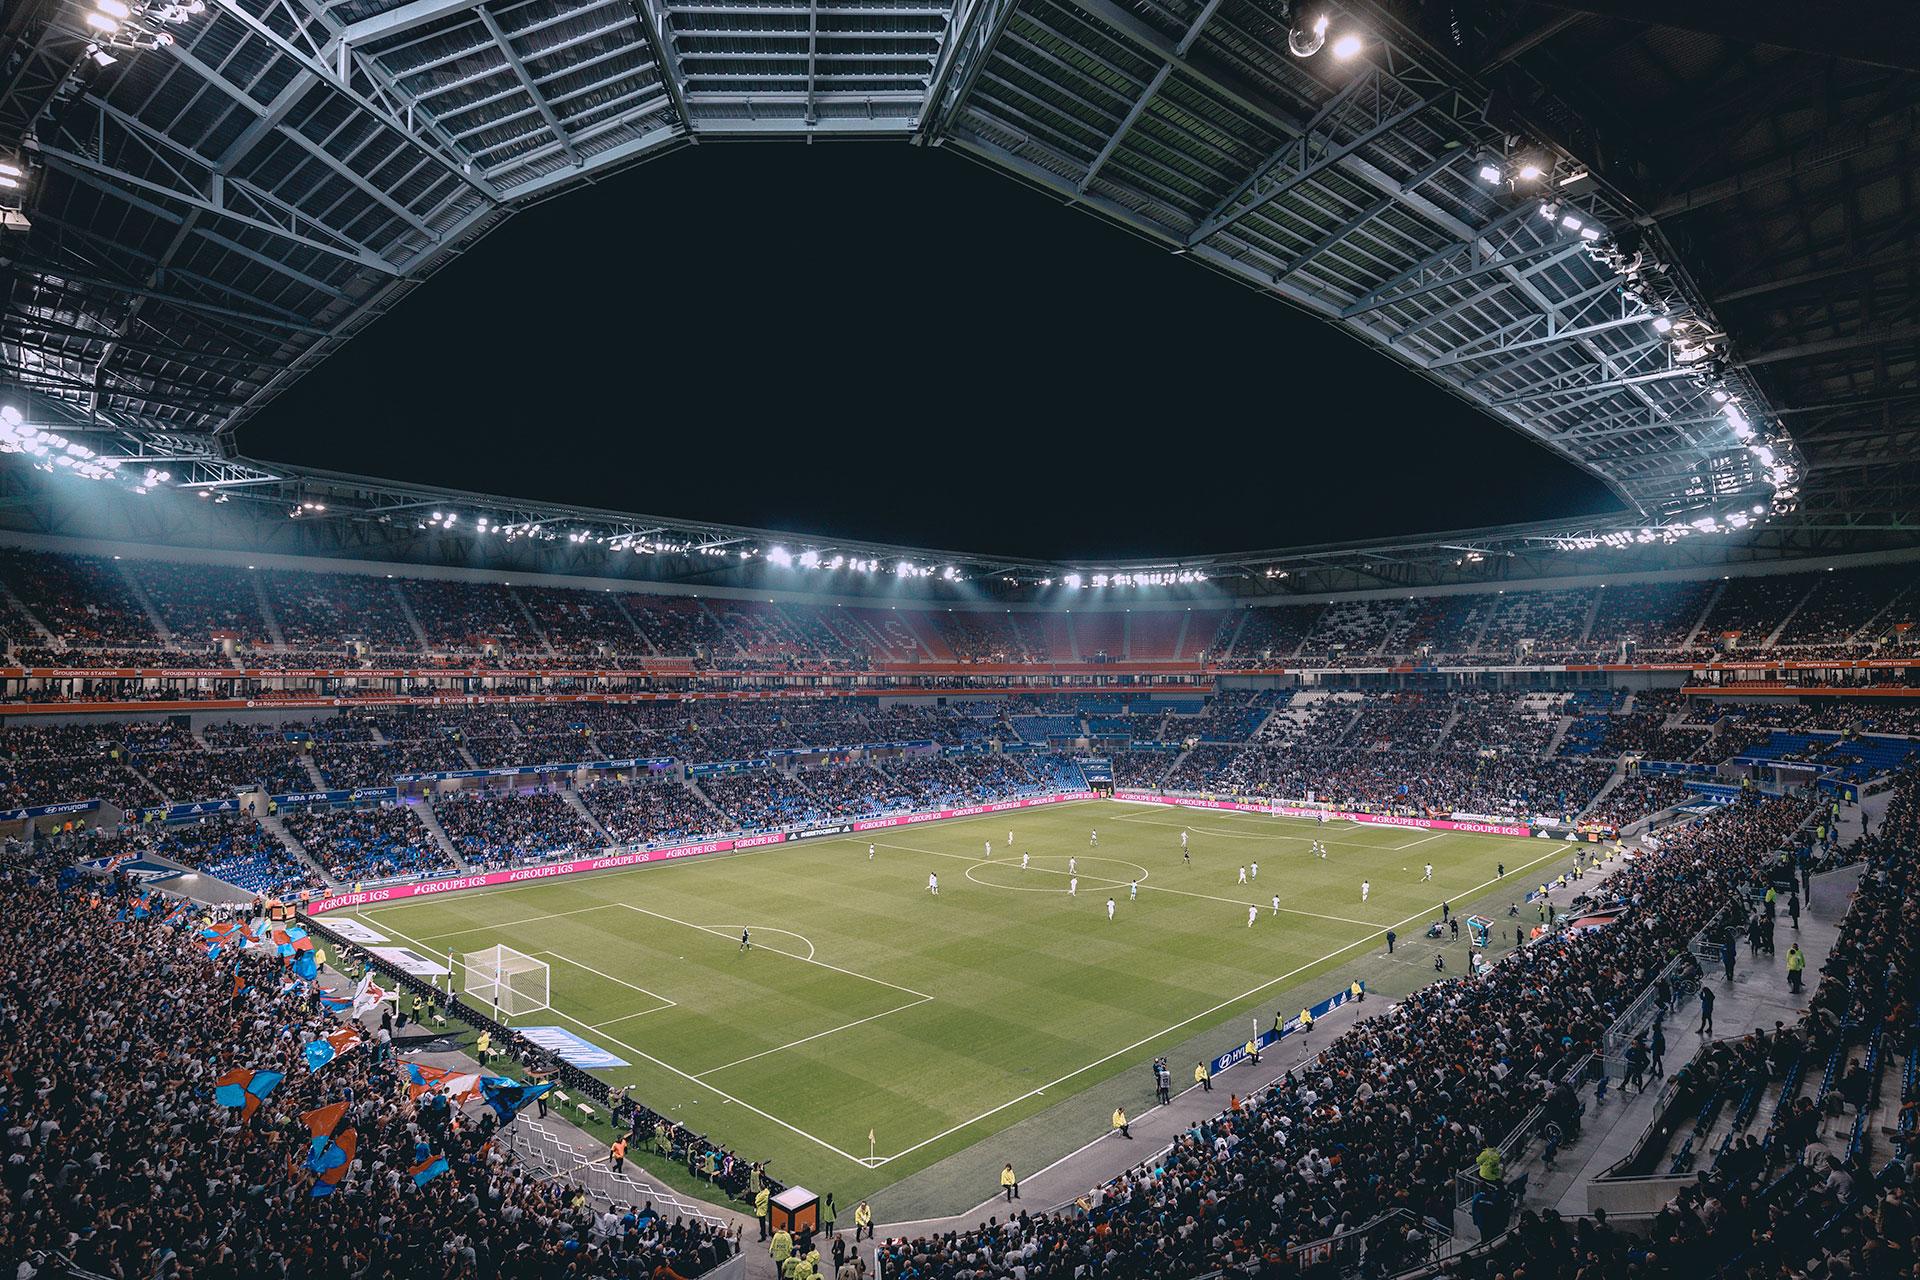 Ai sports soccer game